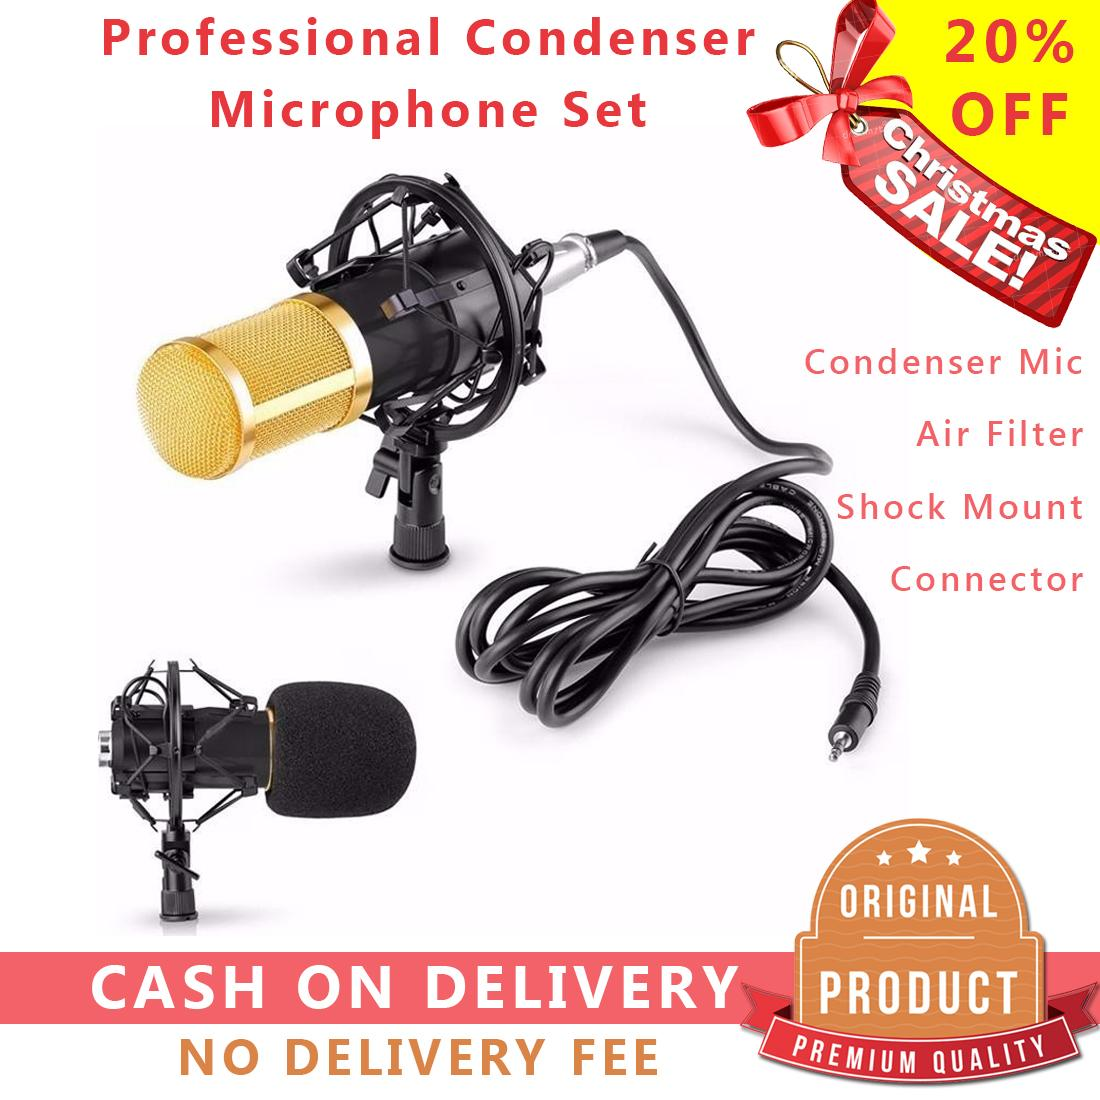 Wireless Mic For Sale Microphone Prices Brands Specs Echo Mics Cb Radio Wiring Condenser Bm 800 Voice Music Studio Recording Shoutcasting Vlog Singing Streaming Broadcasting Karaoke